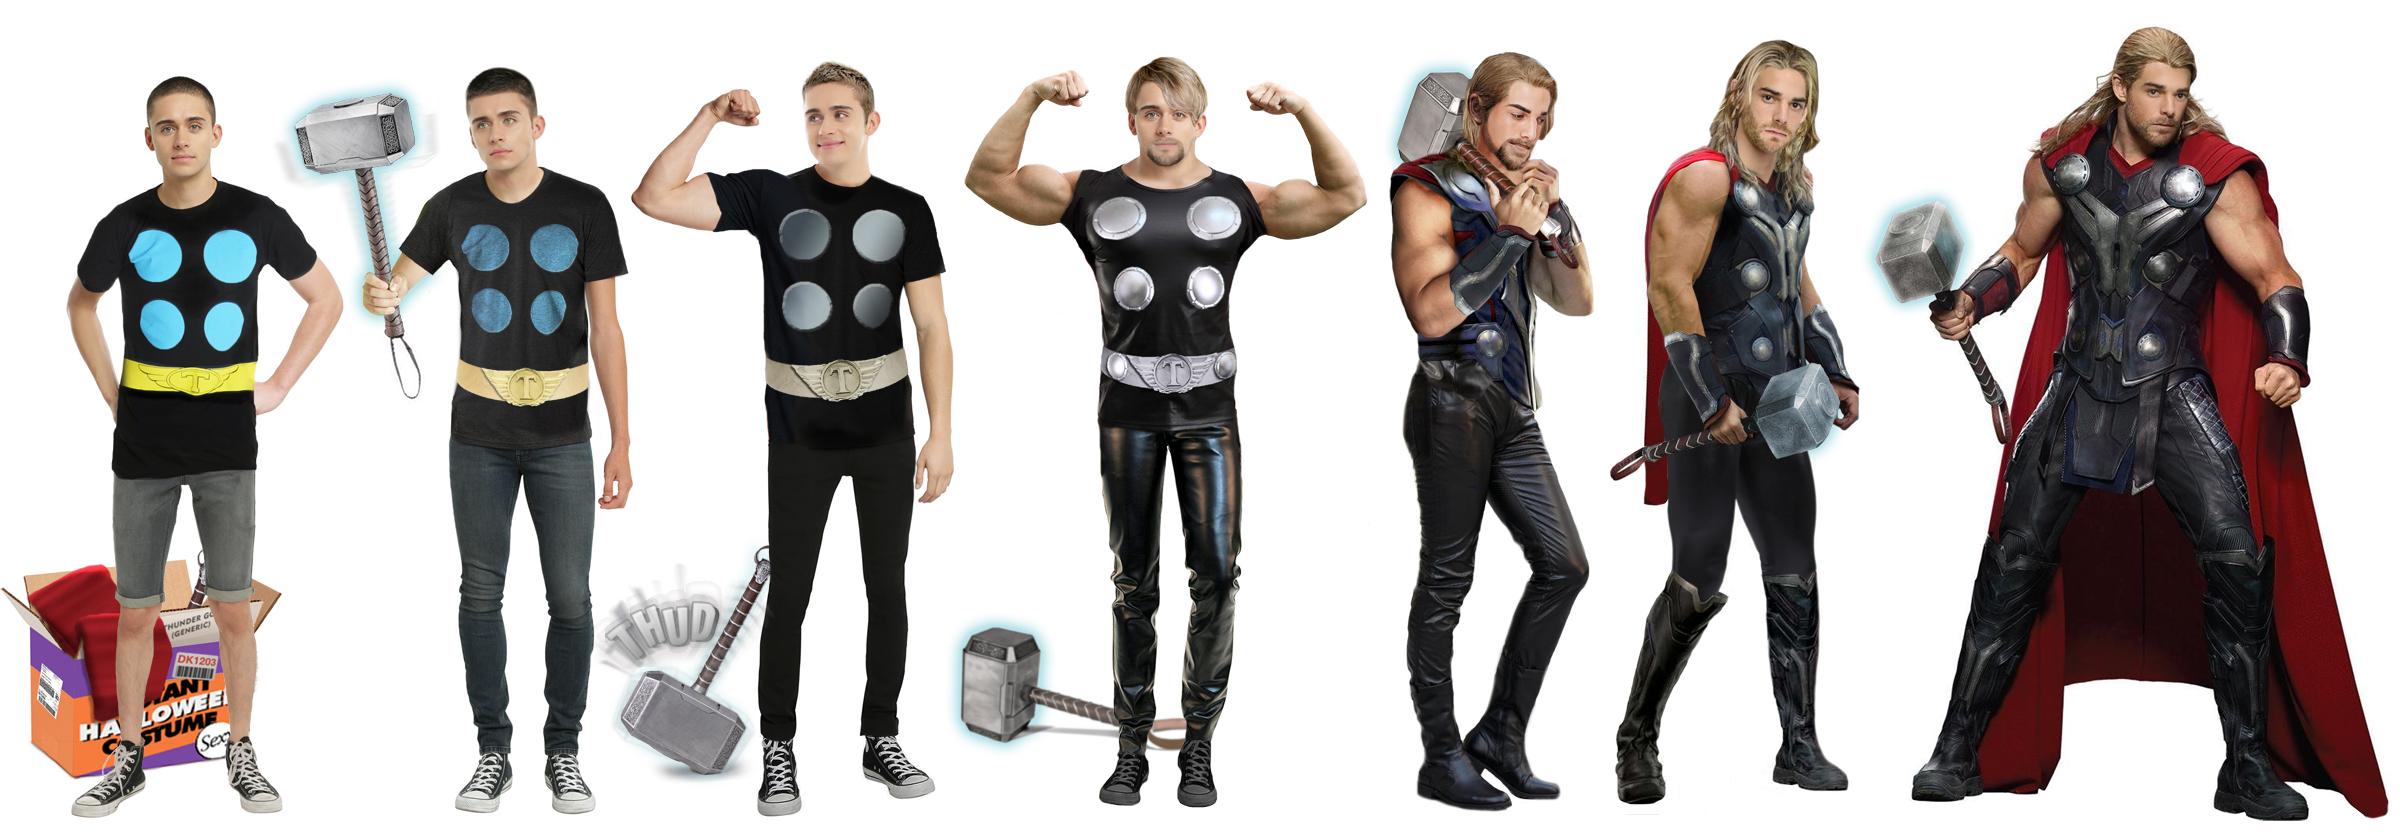 Instant Halloween Costume: Feelin\' Mighty Thor by CrisKane on ...